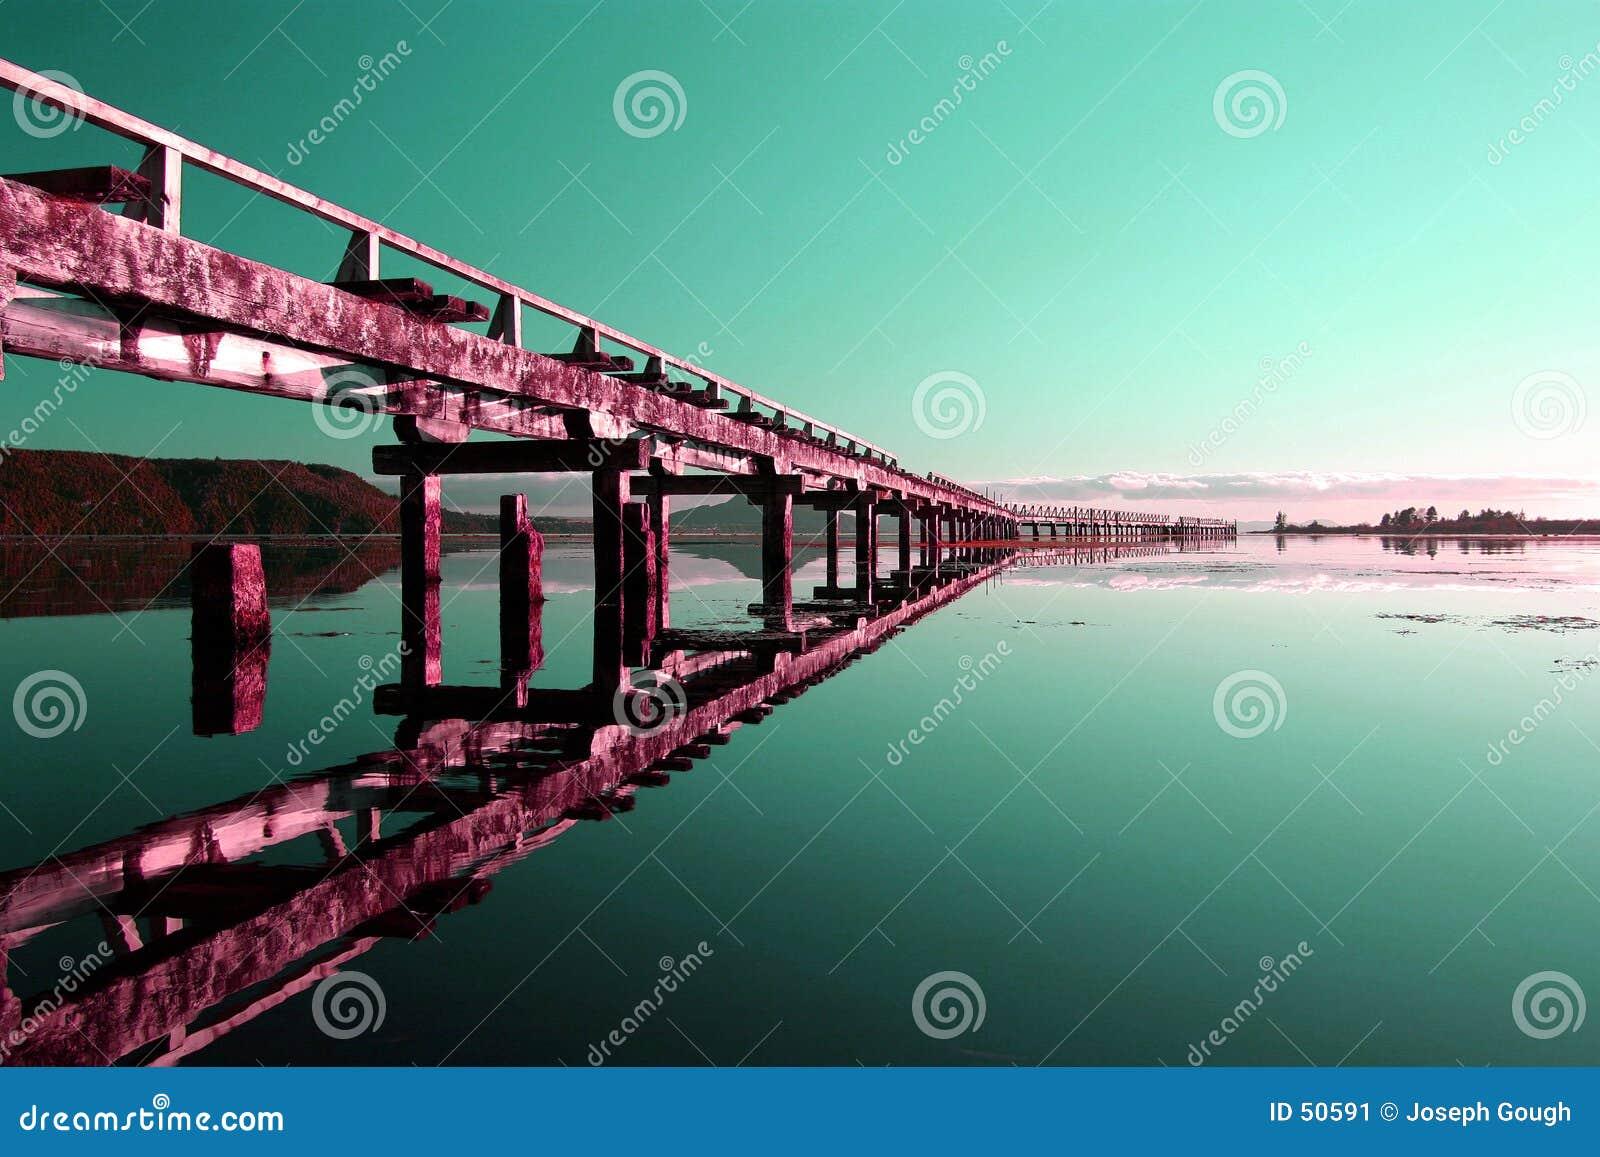 Abstract, Derelict Pier